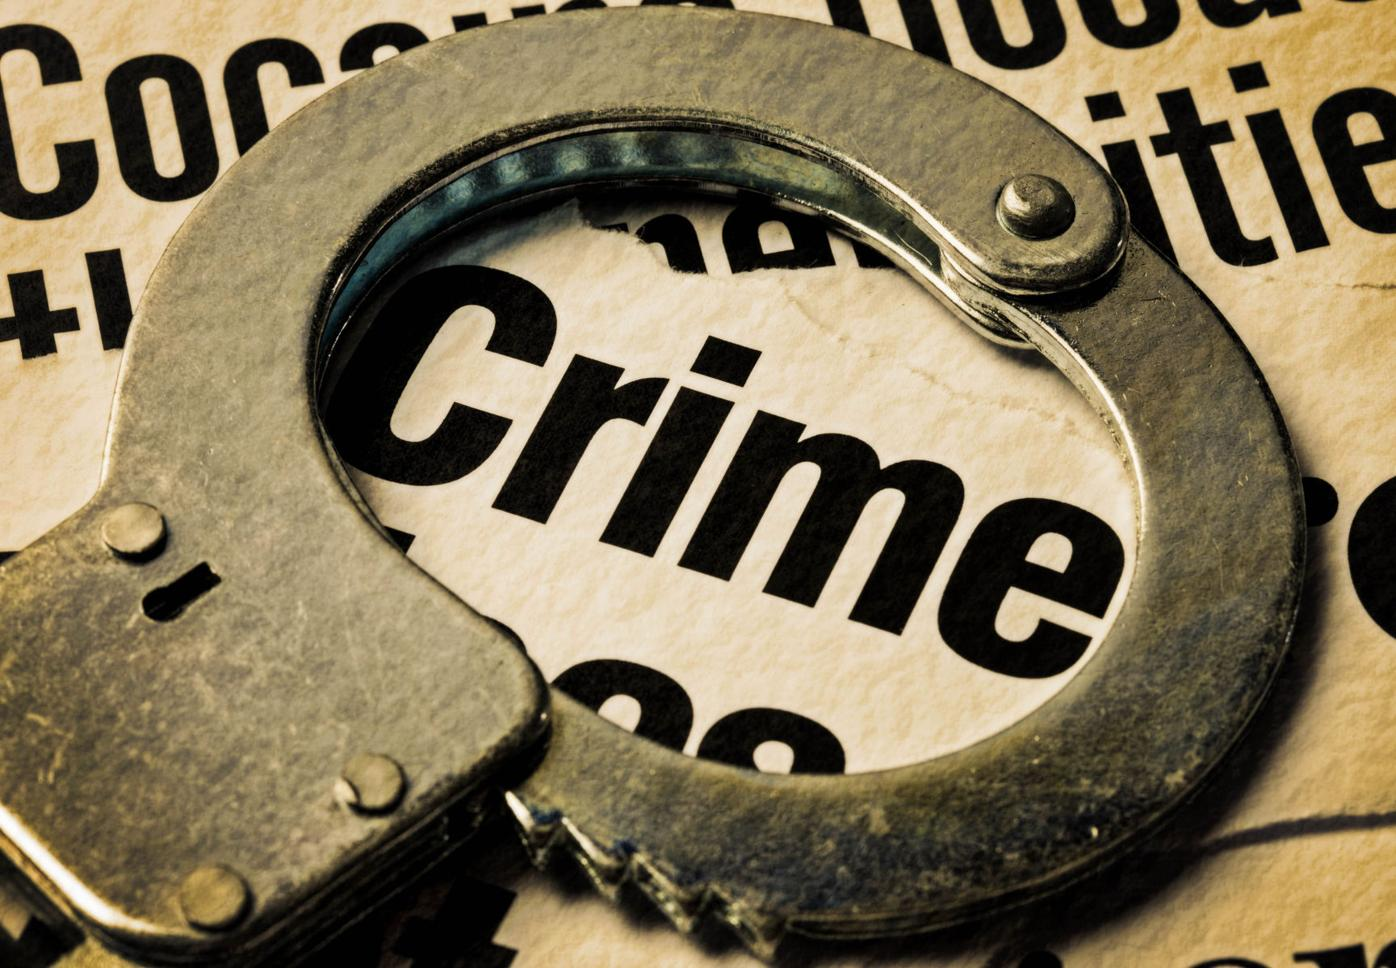 crime cuffs.jpg